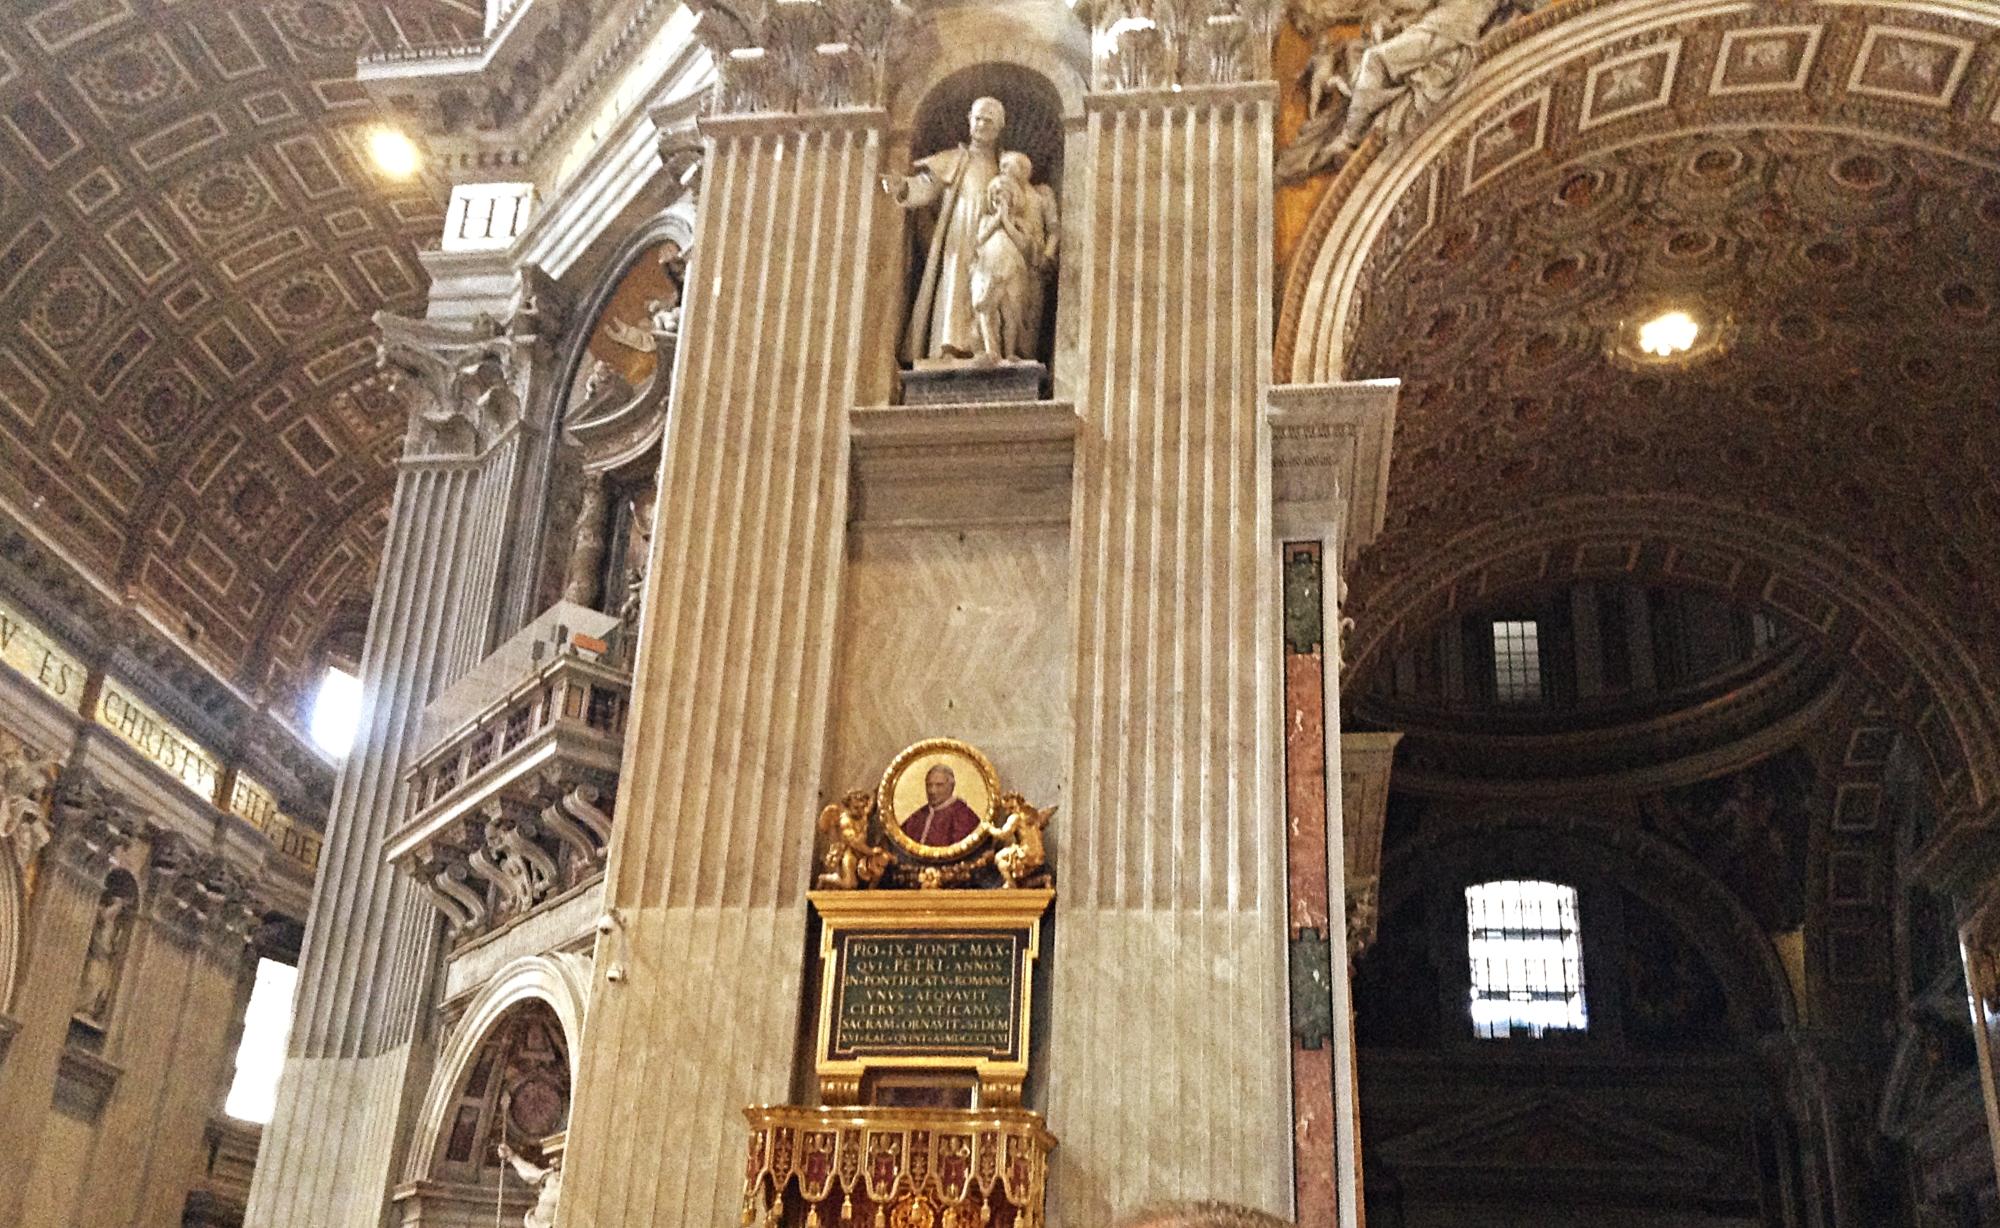 St. Peters Basilica Interiors